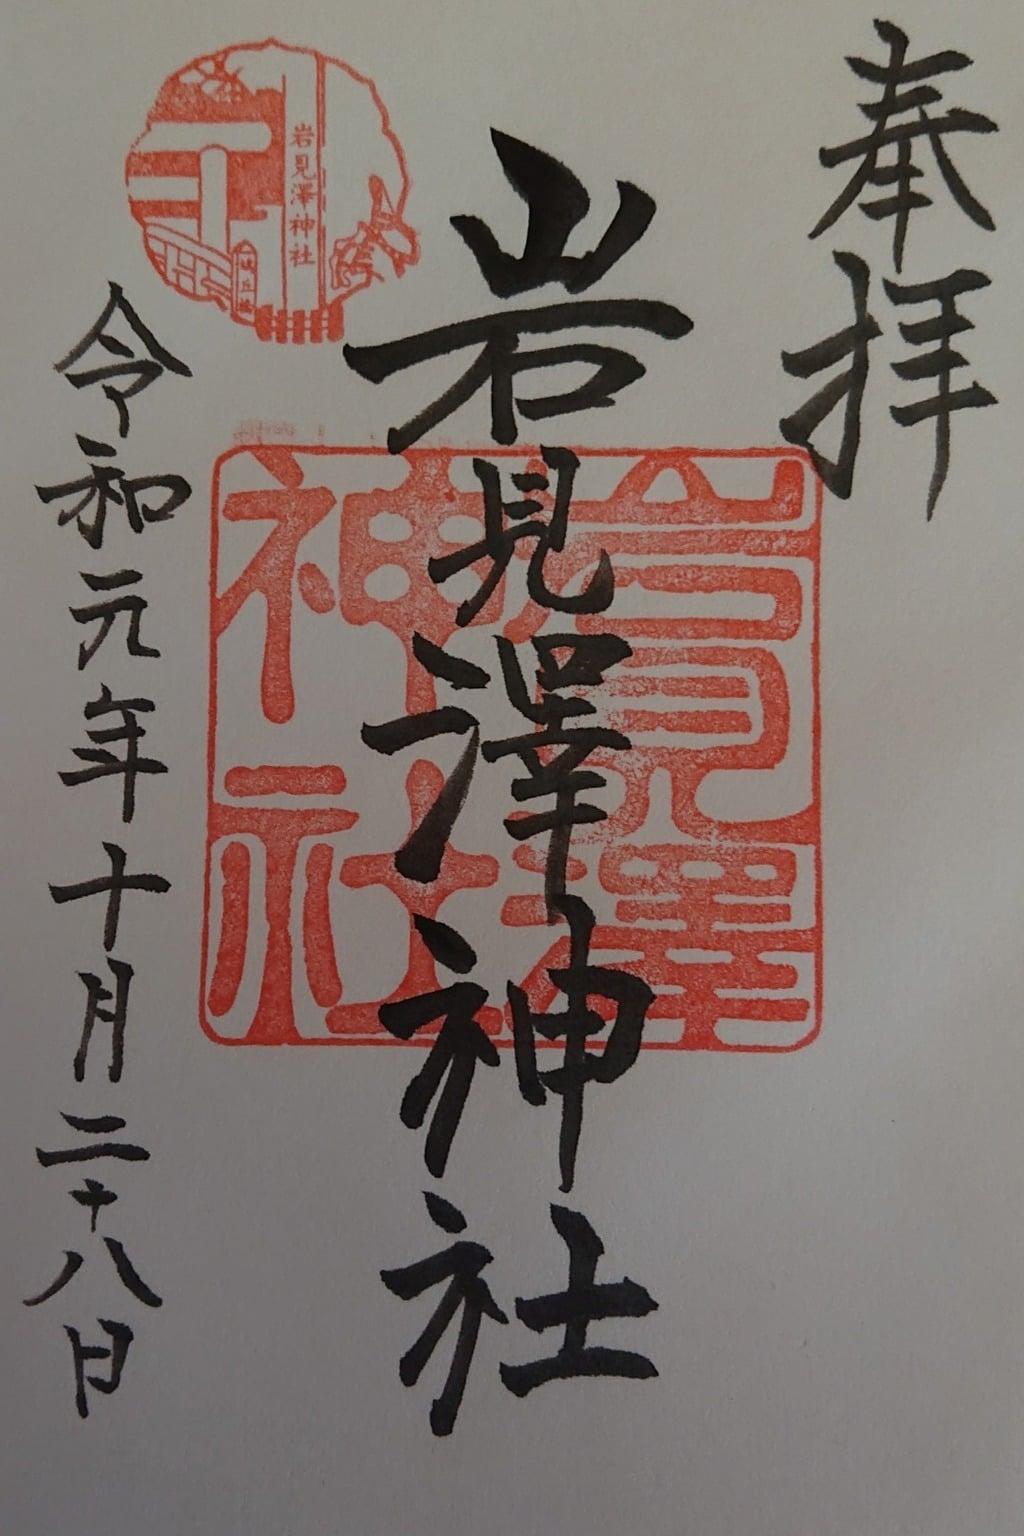 岩見沢神社の御朱印